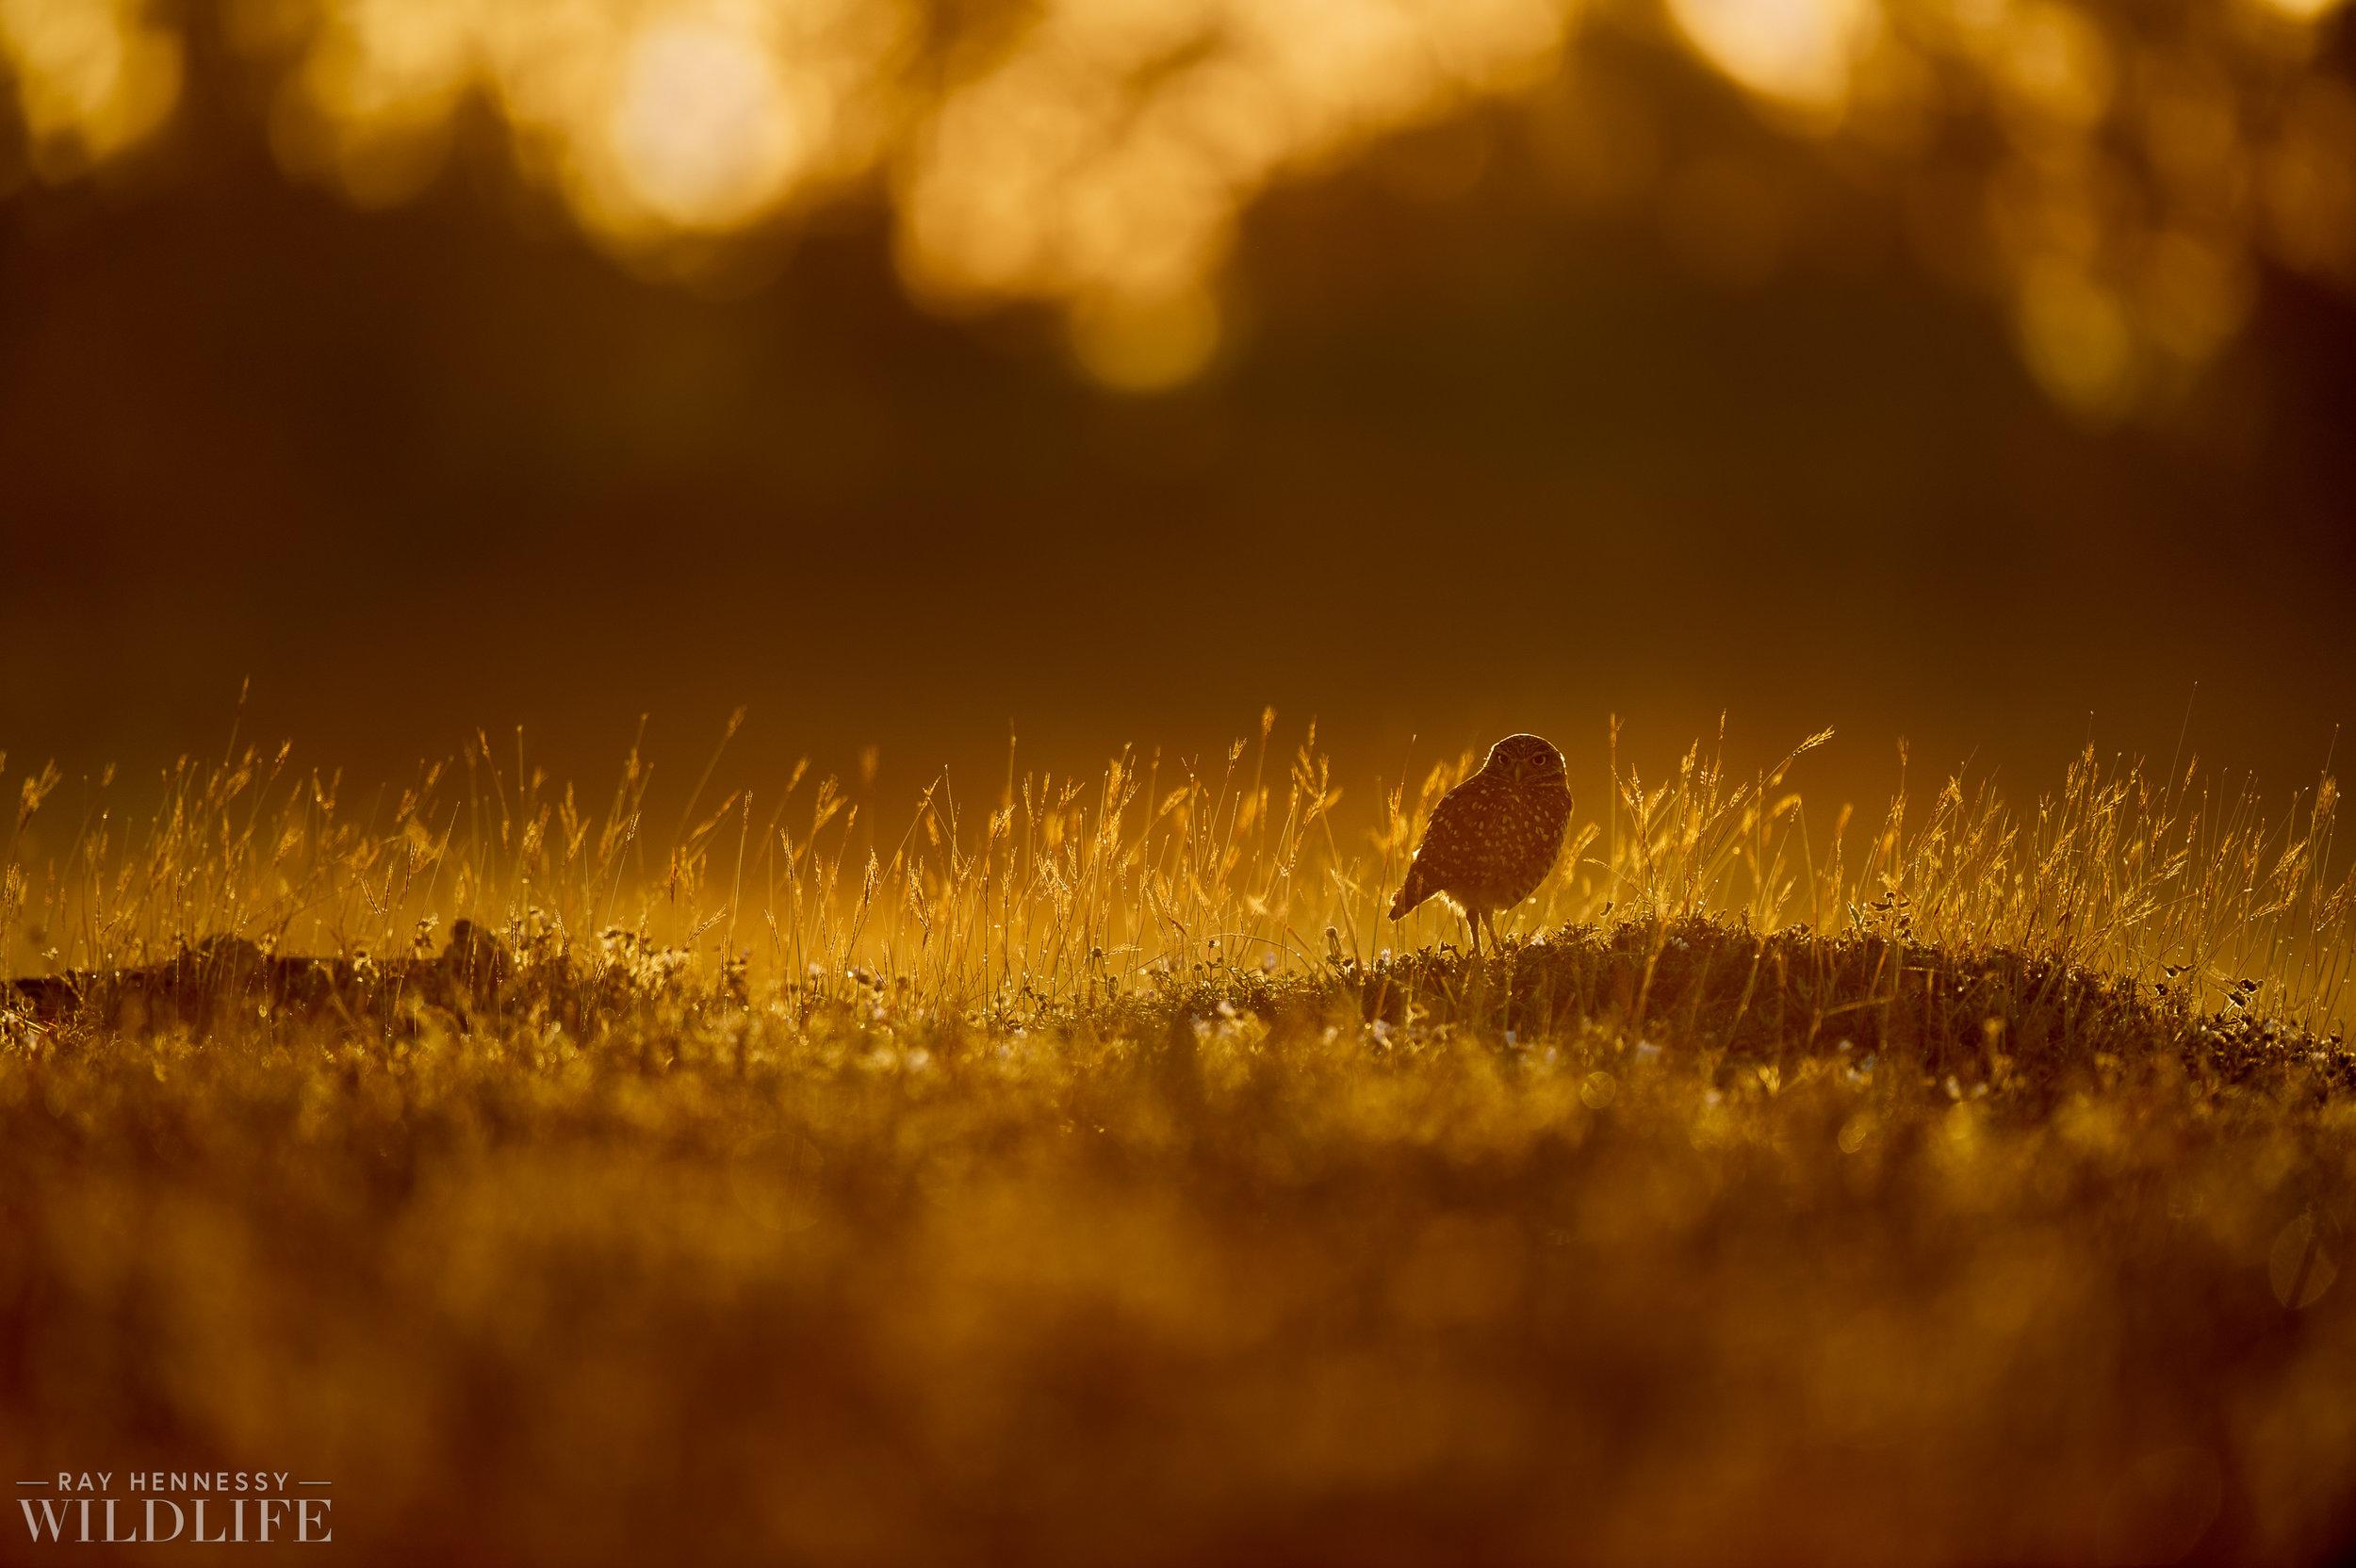 006_burrowing-owls-blue-heron-florida.jpg